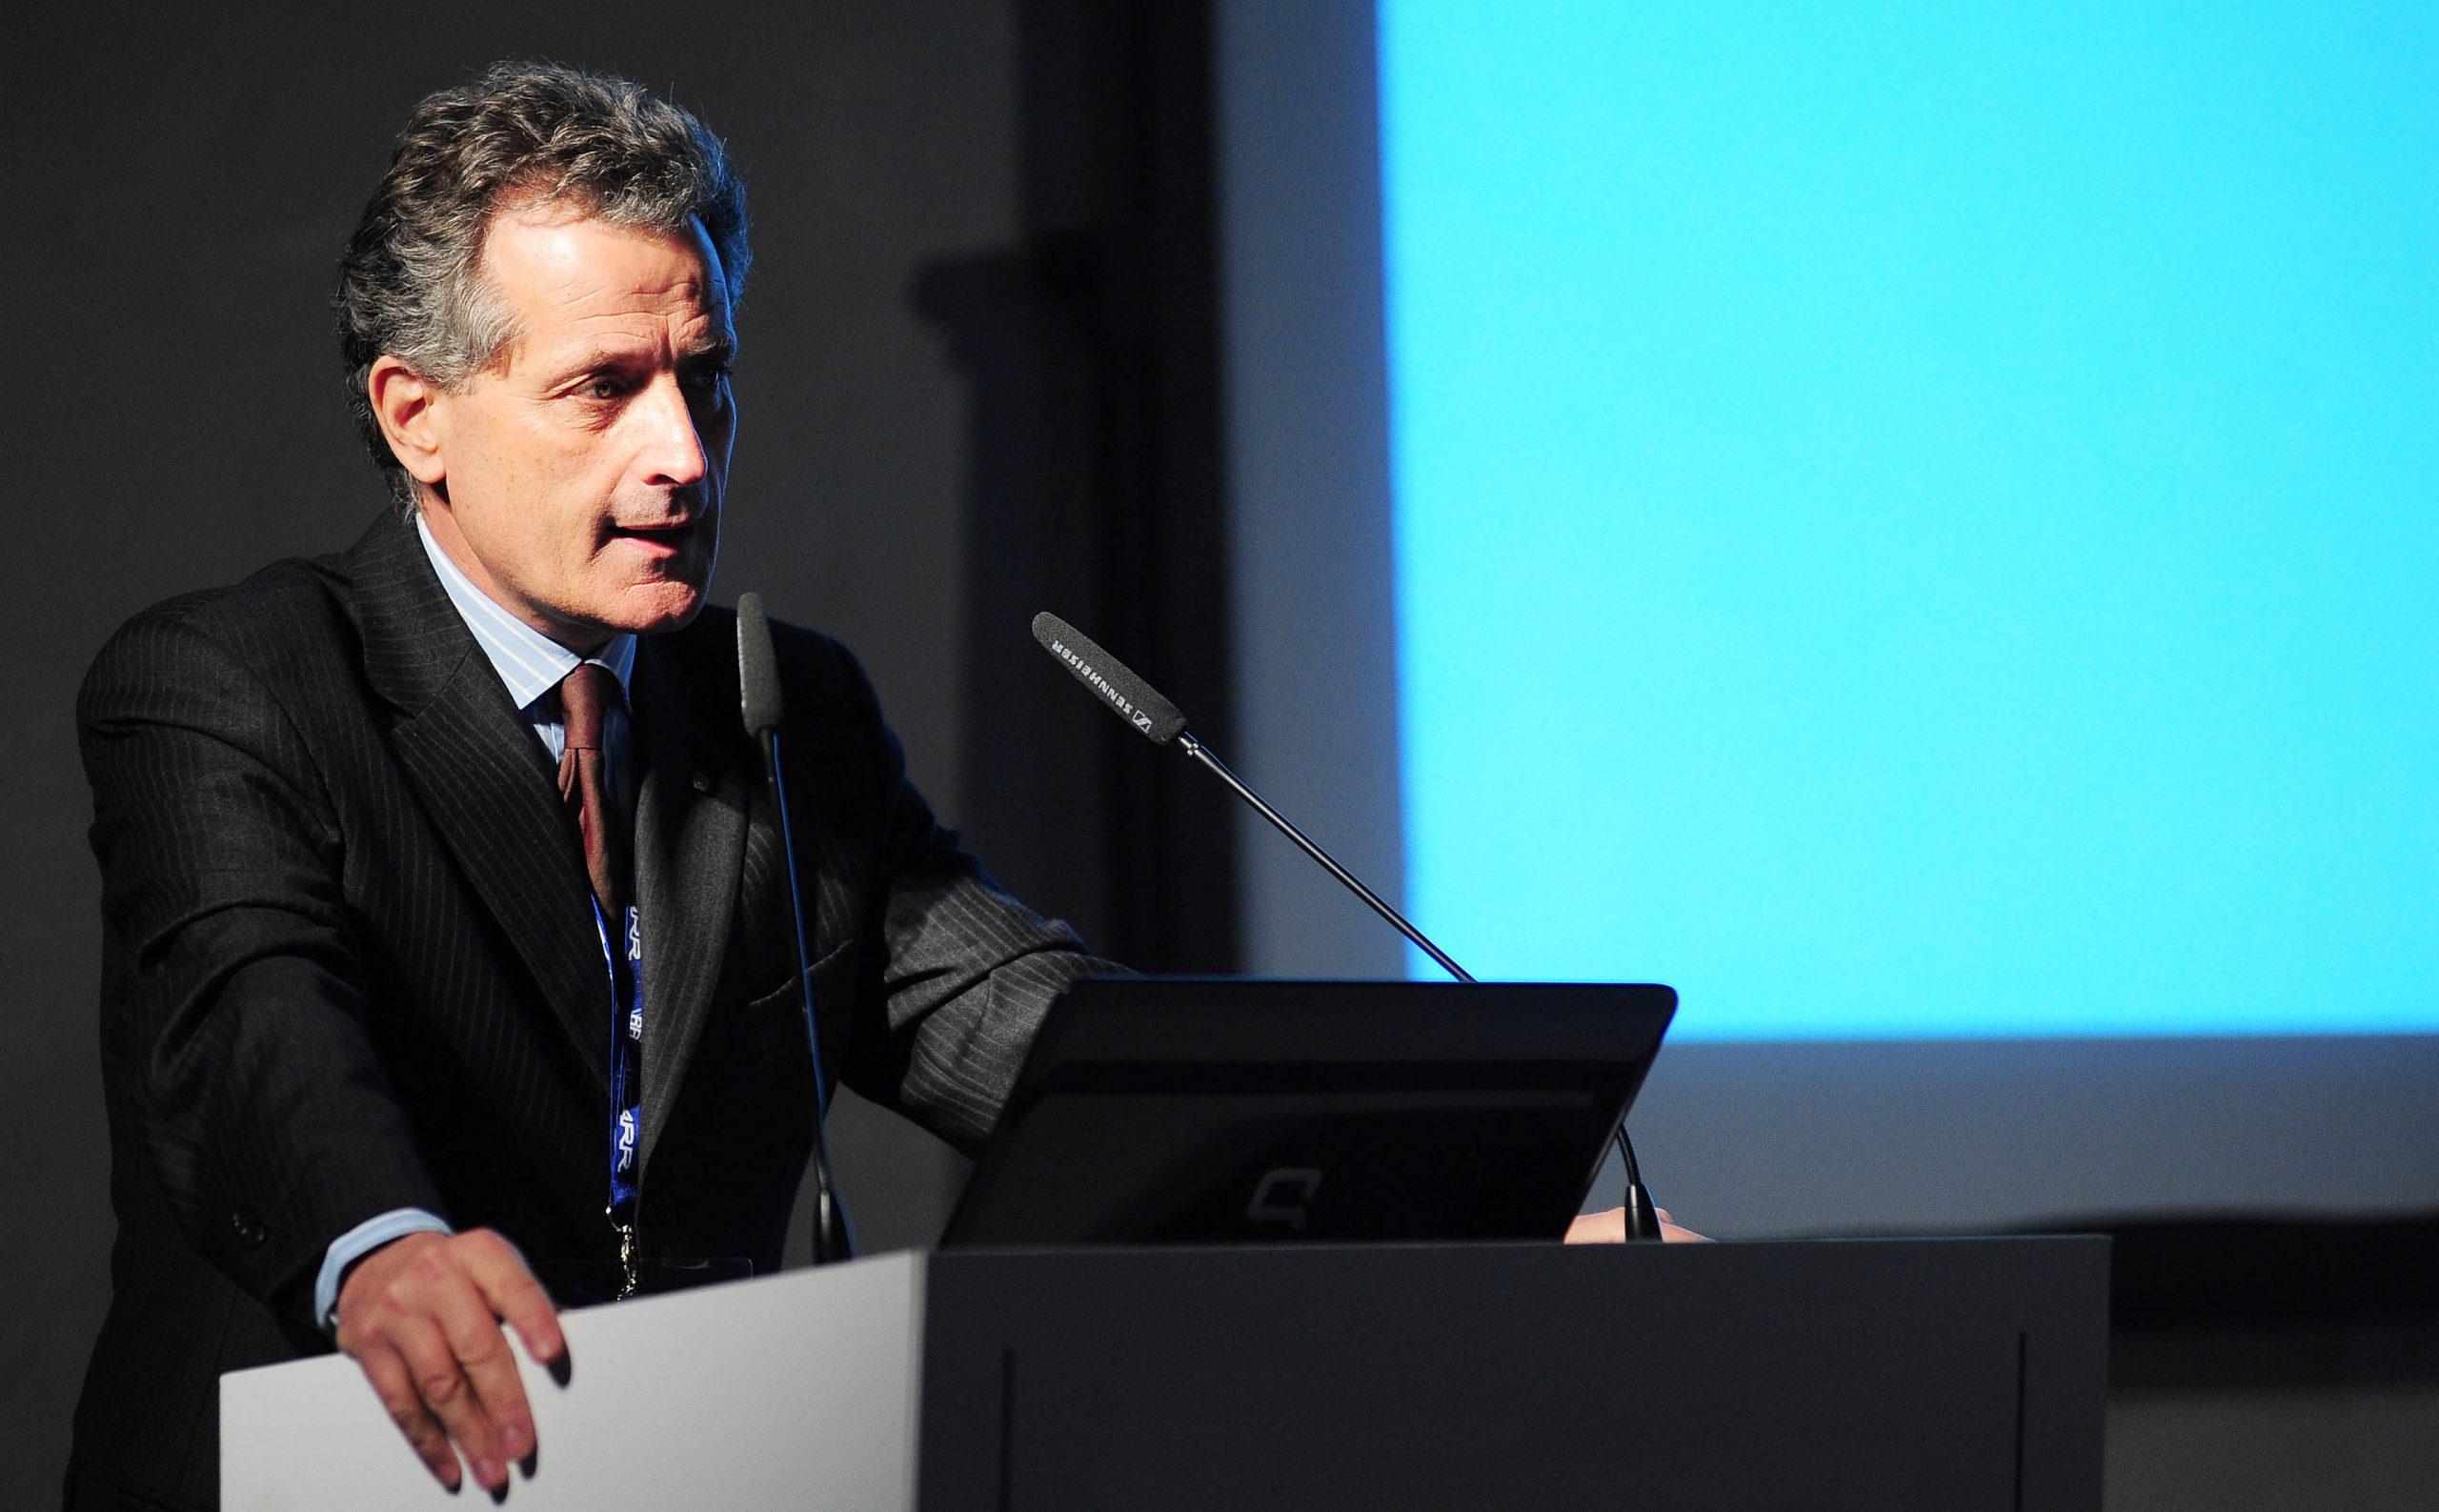 Rinnovabili: niente sconti. Intervista al Presidente FREE, De Santoli